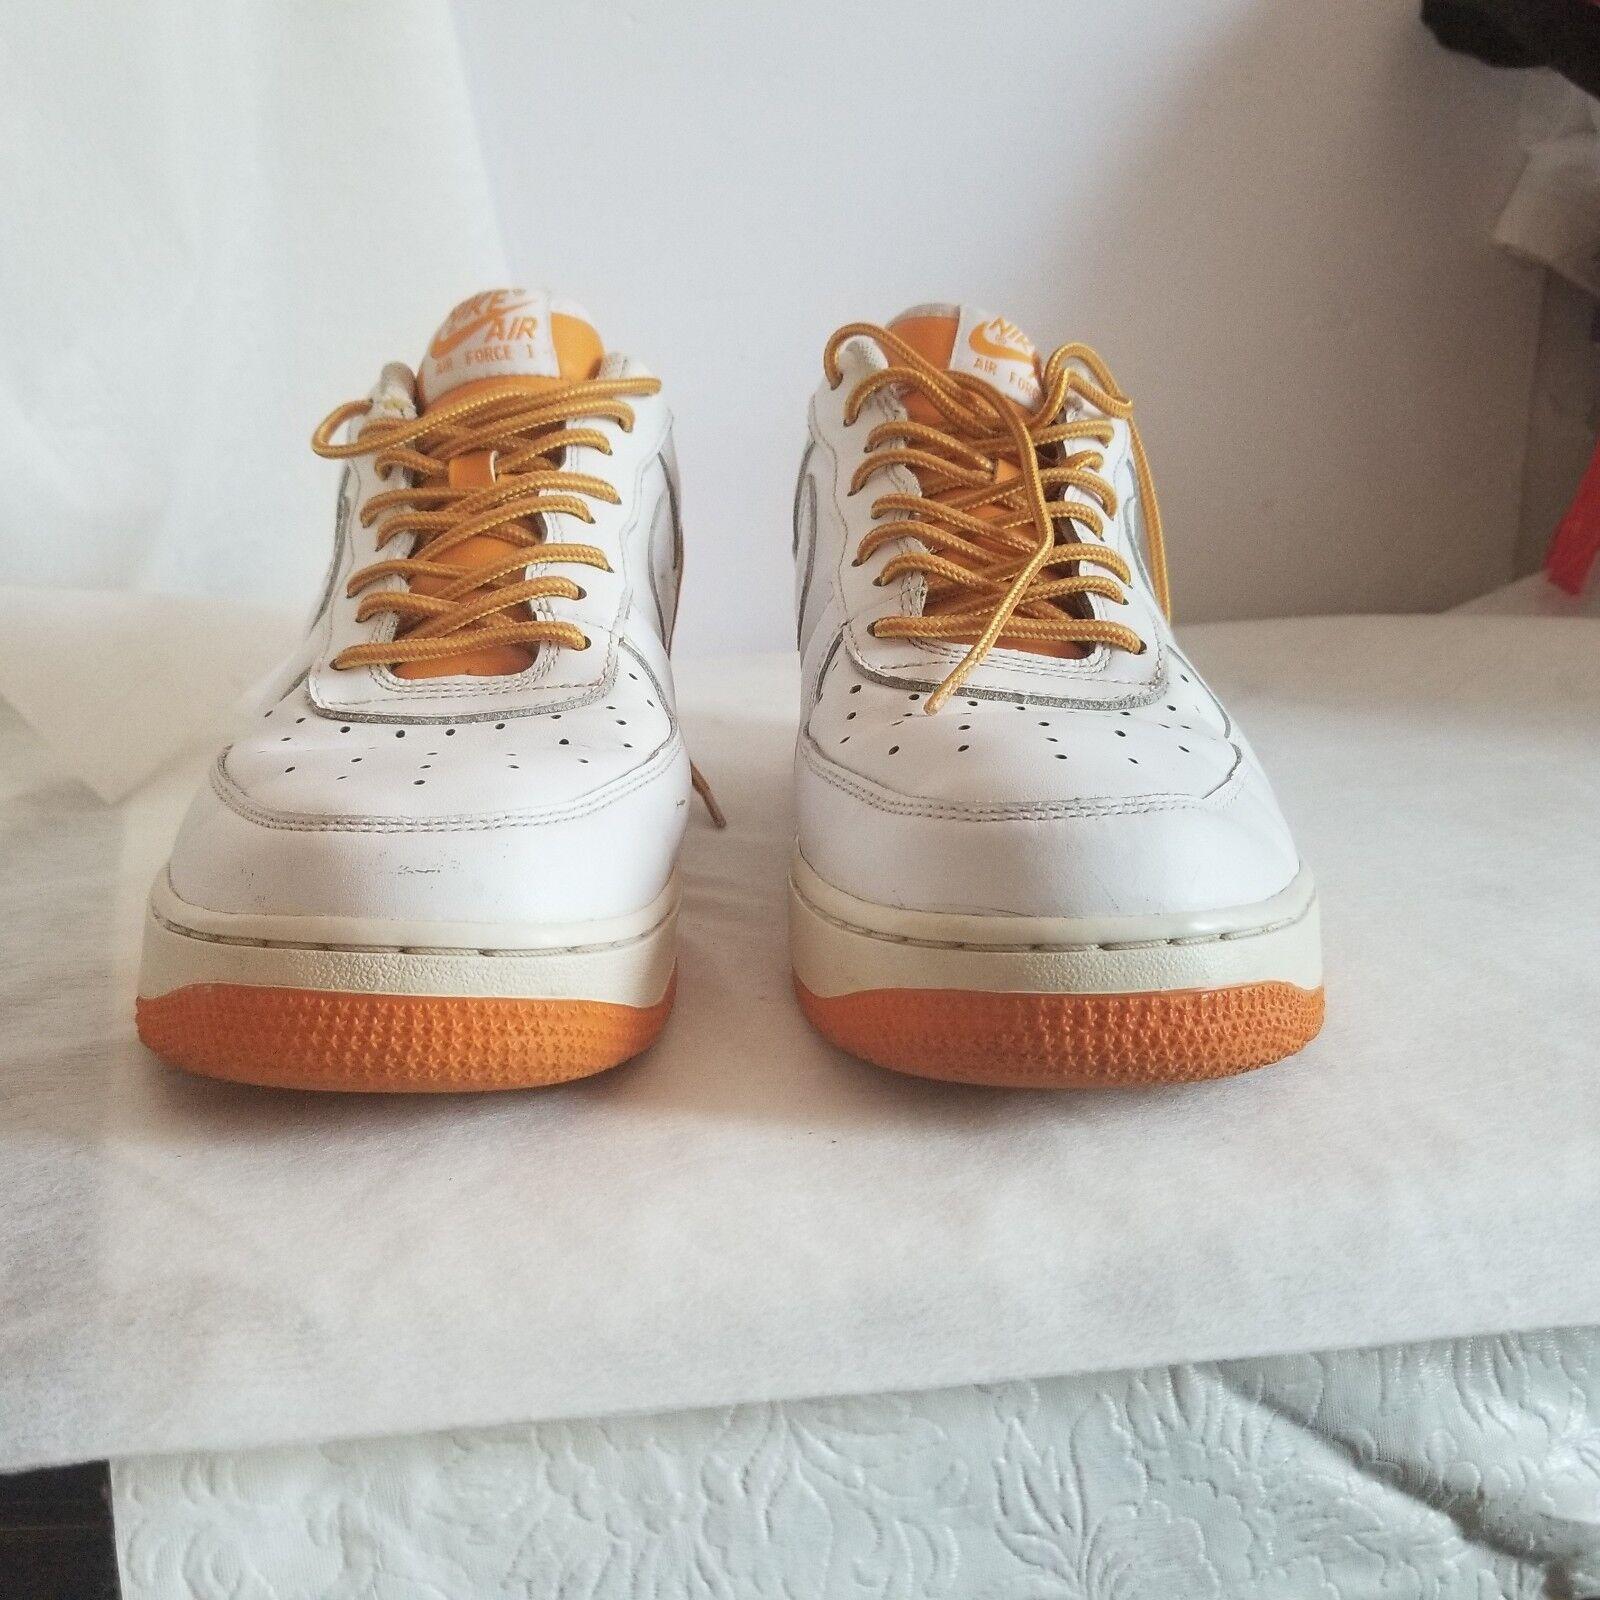 Nike Men's Air Force1 '07 White / Dark Orange  Size 11  315122-117